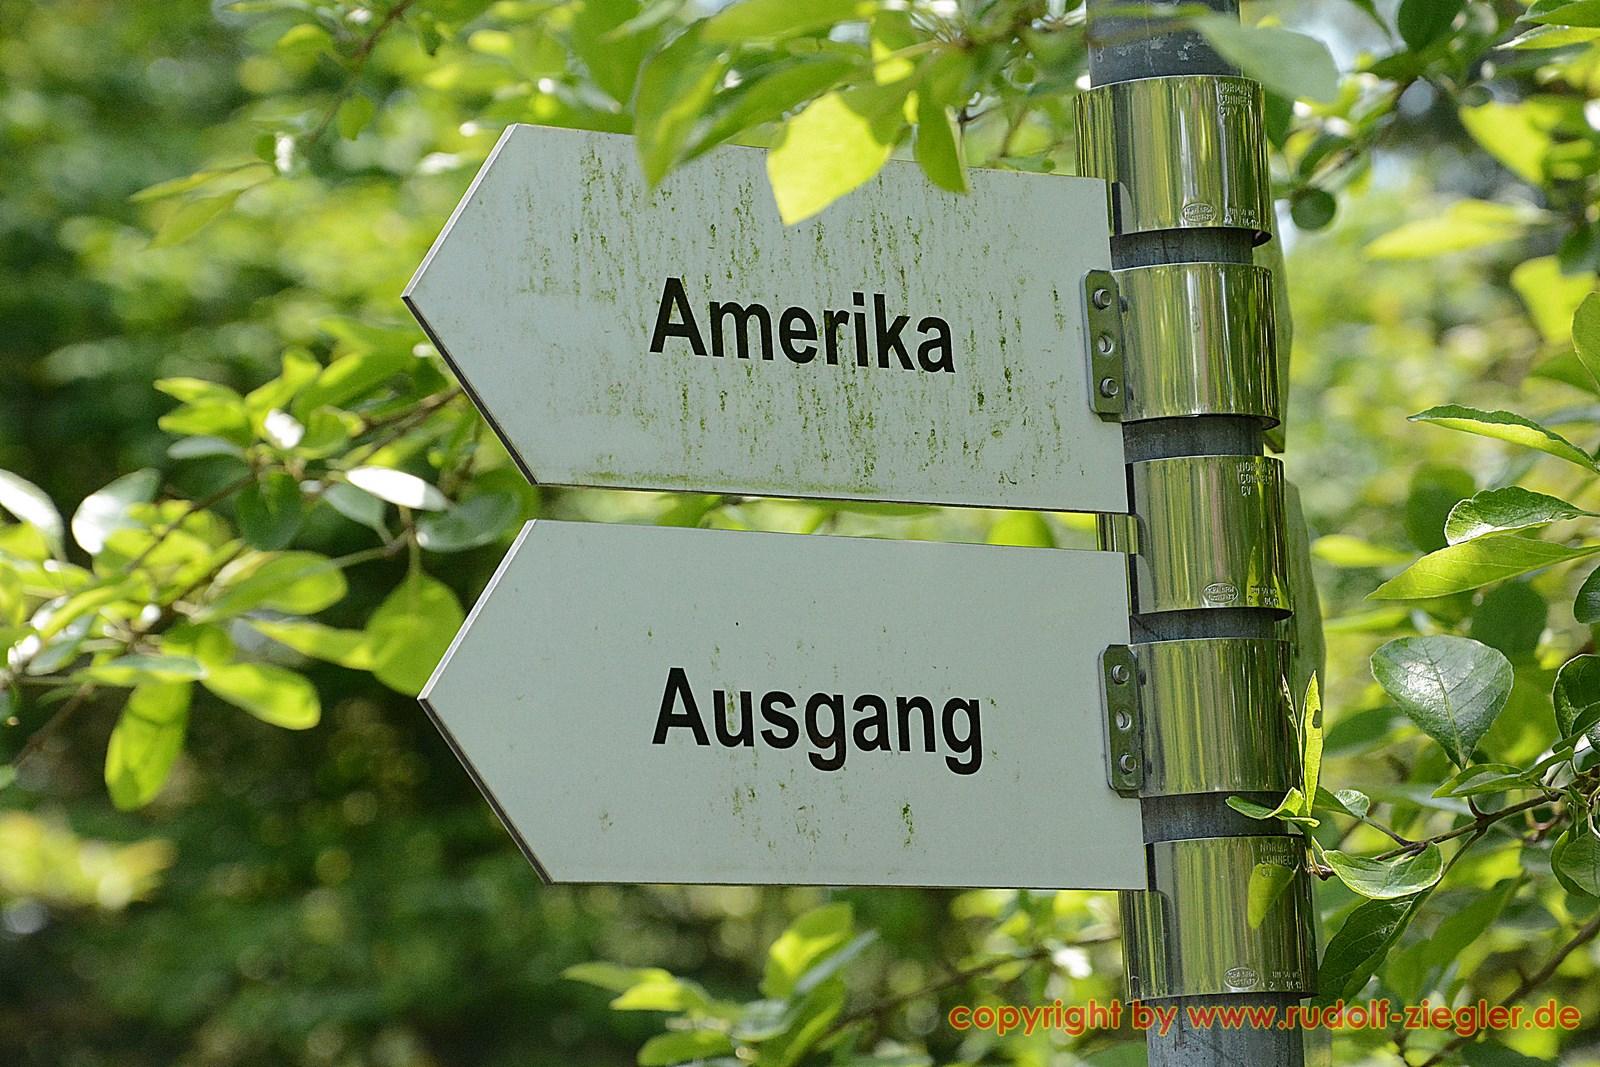 Botanischer Garten Bayreuth 051-A-S (1600x1200)